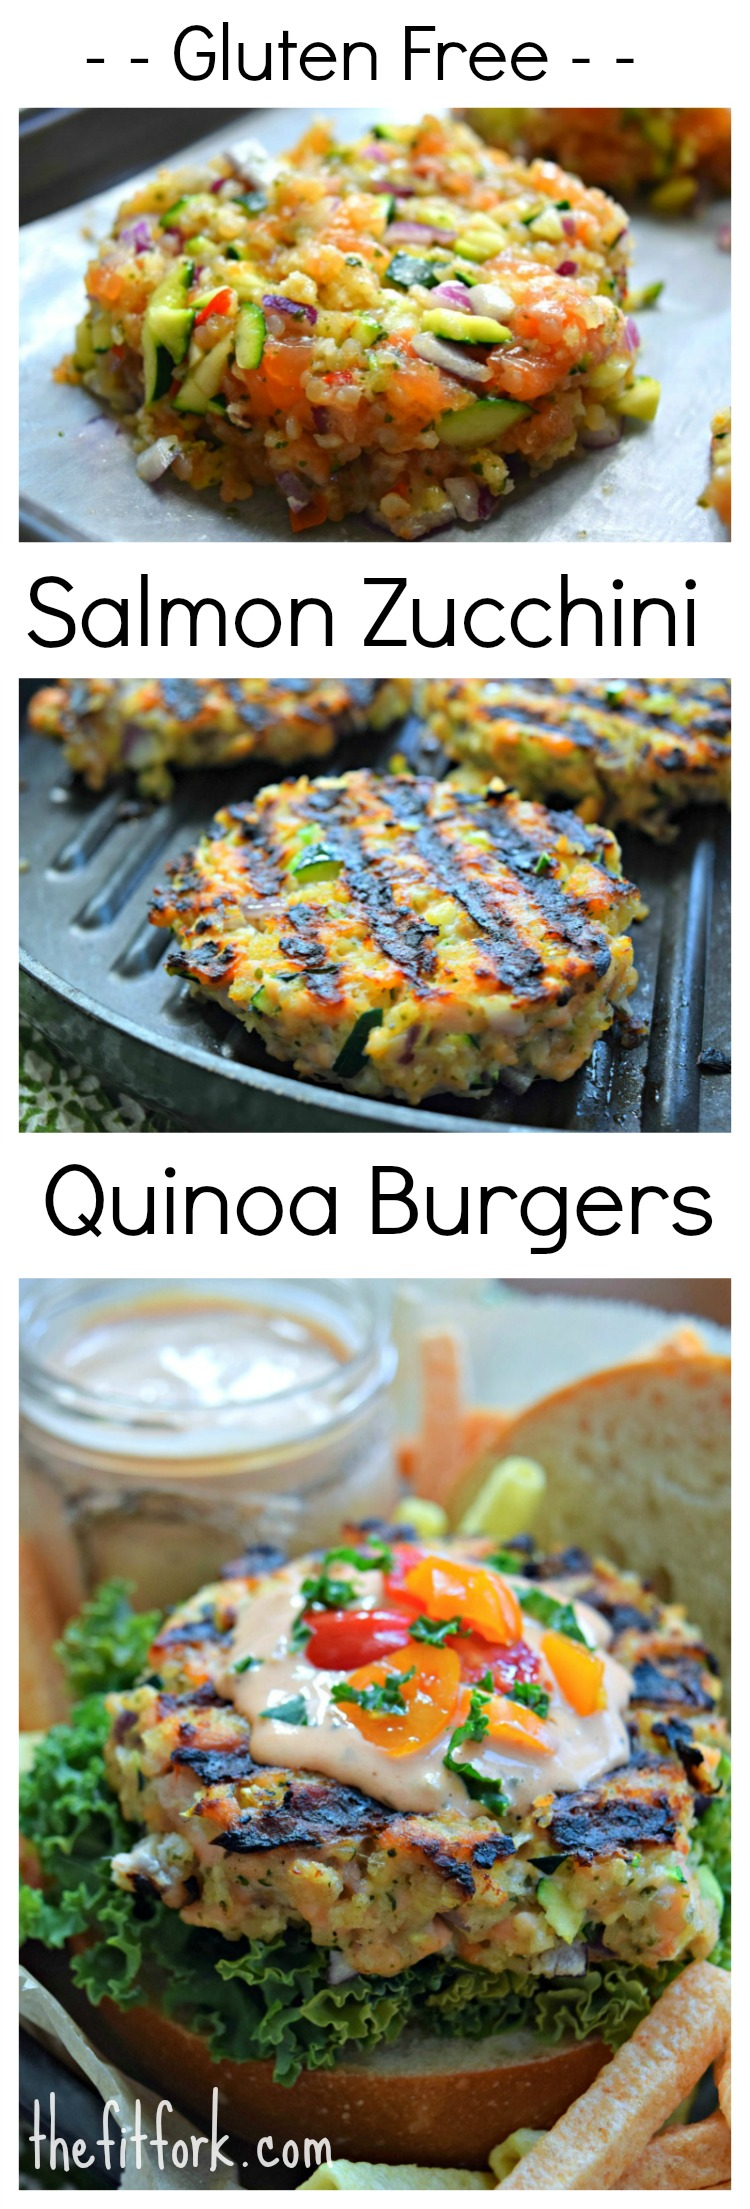 Grilled Salmon Zucchini Quinoa Burgers | thefitfork.com